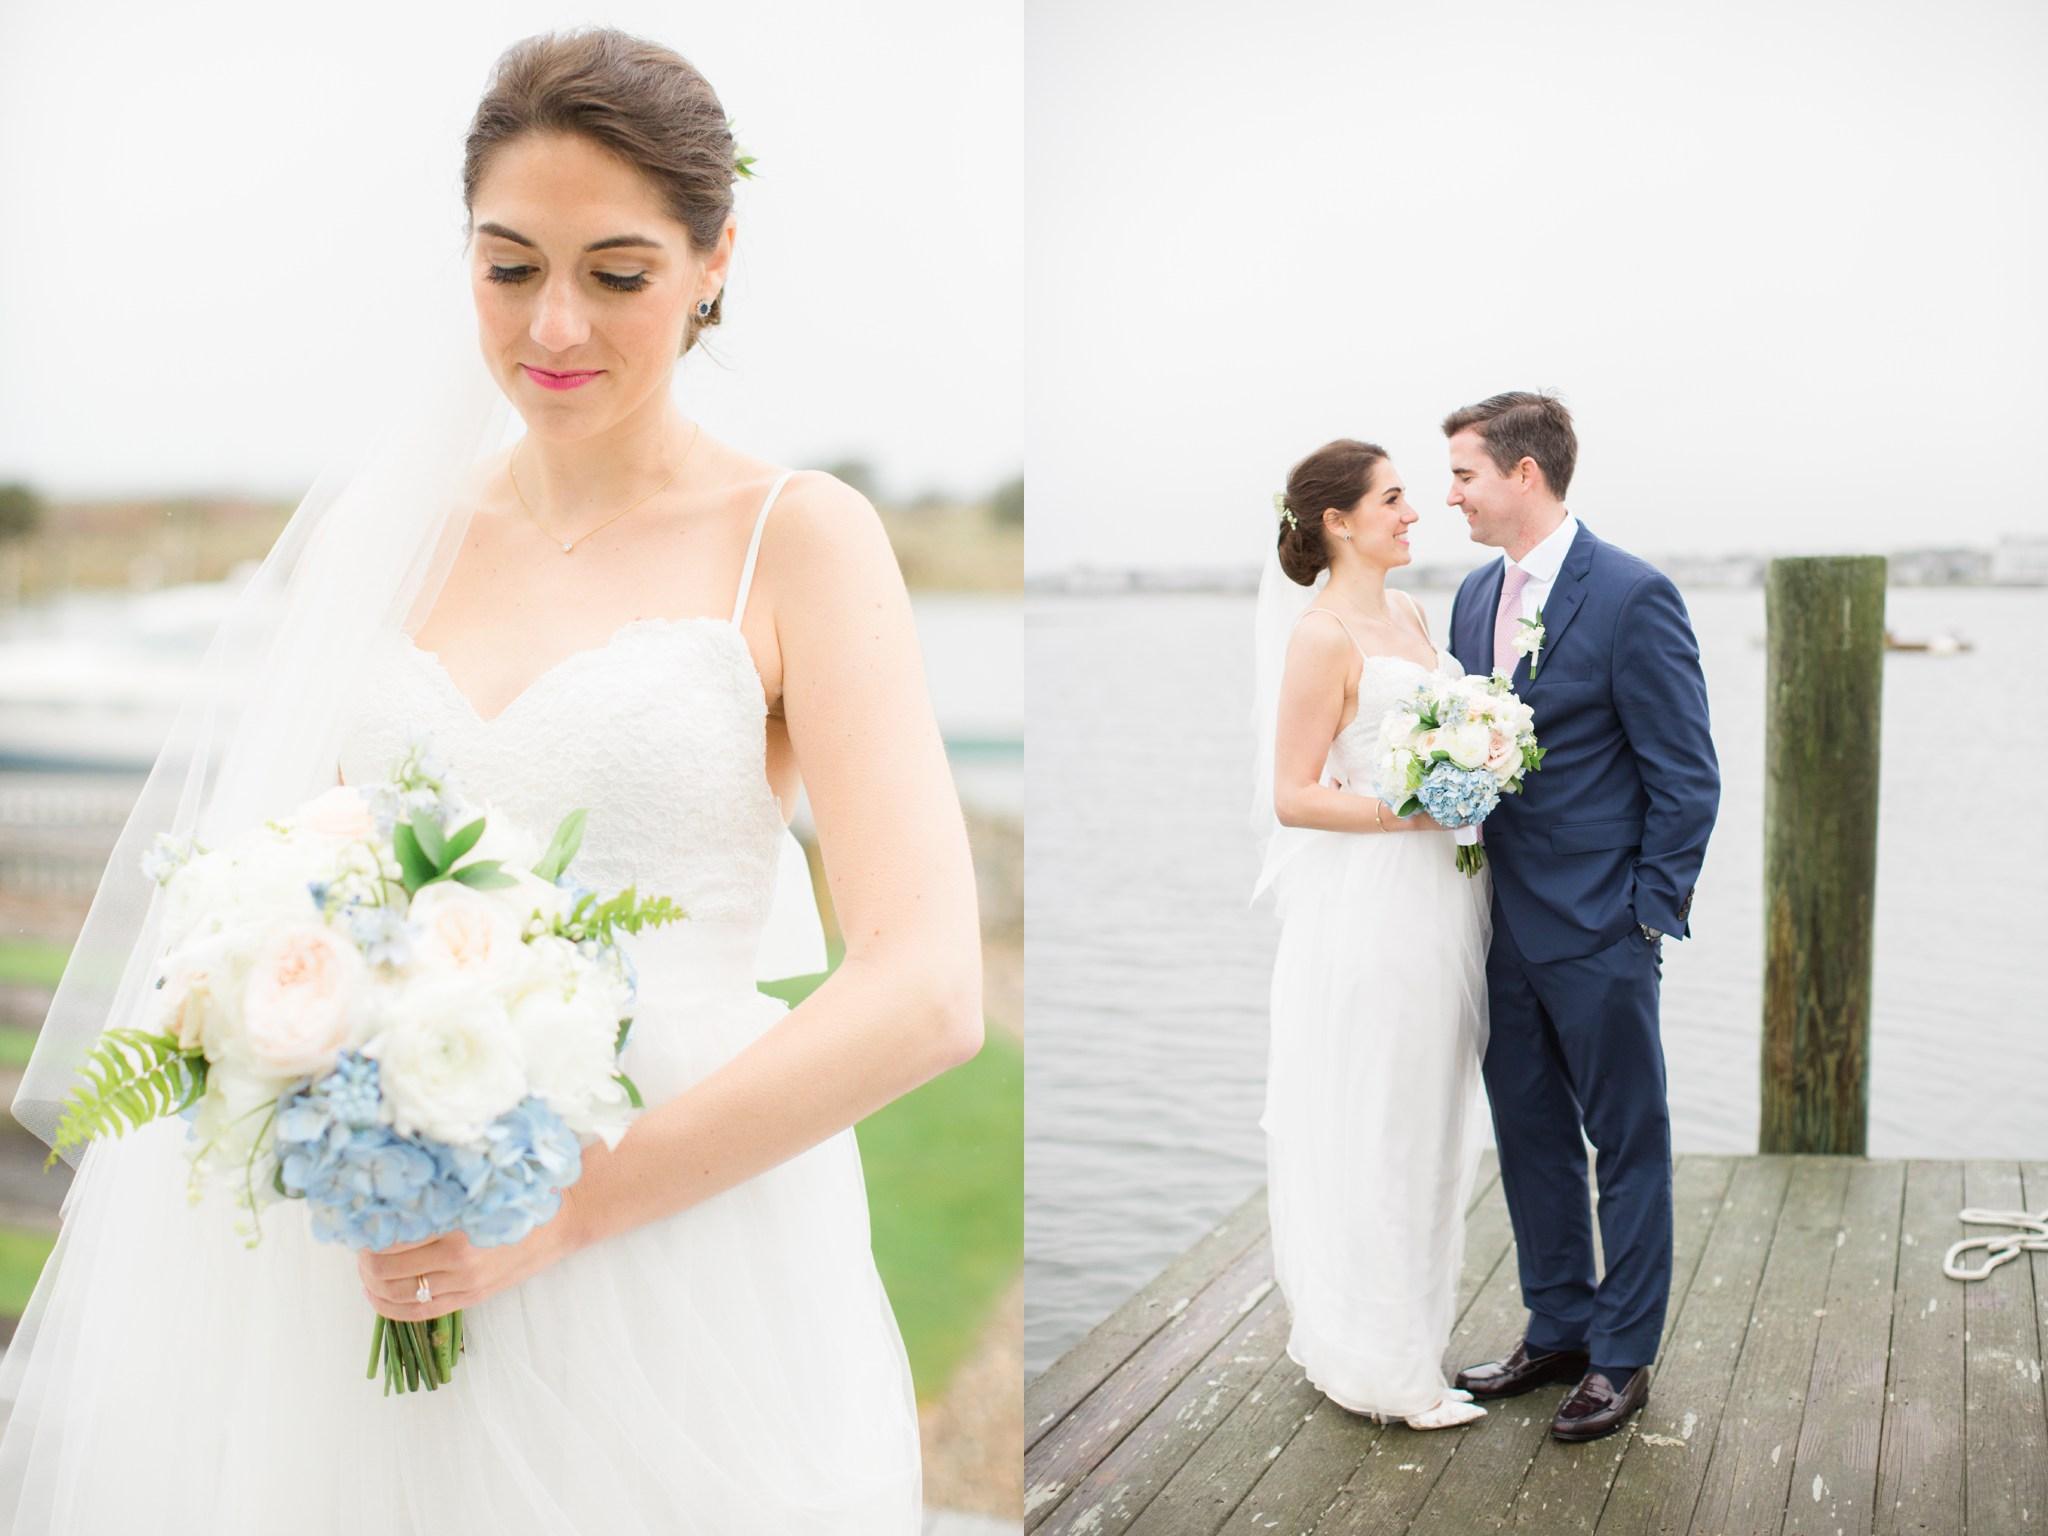 cape_cod_wedding_deborah_zoe_Photography_00062.JPG